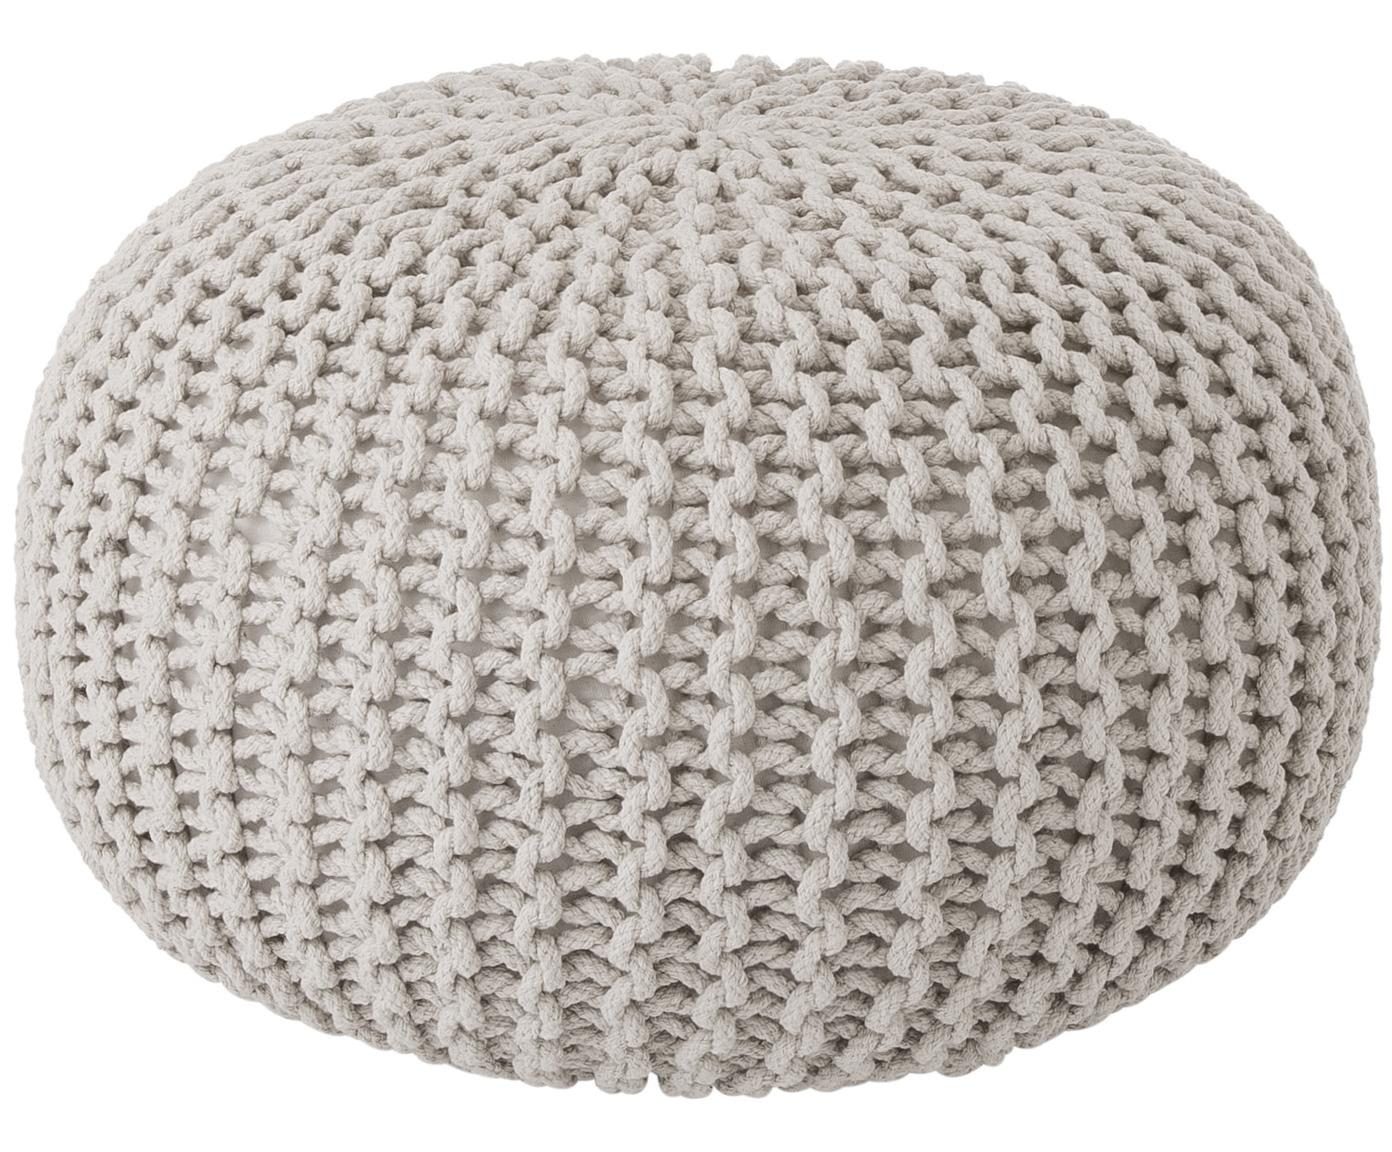 Puf de punto artesanal Dori, Tapizado: 100% algodón, Beige, Ø 55 x Al 35 cm